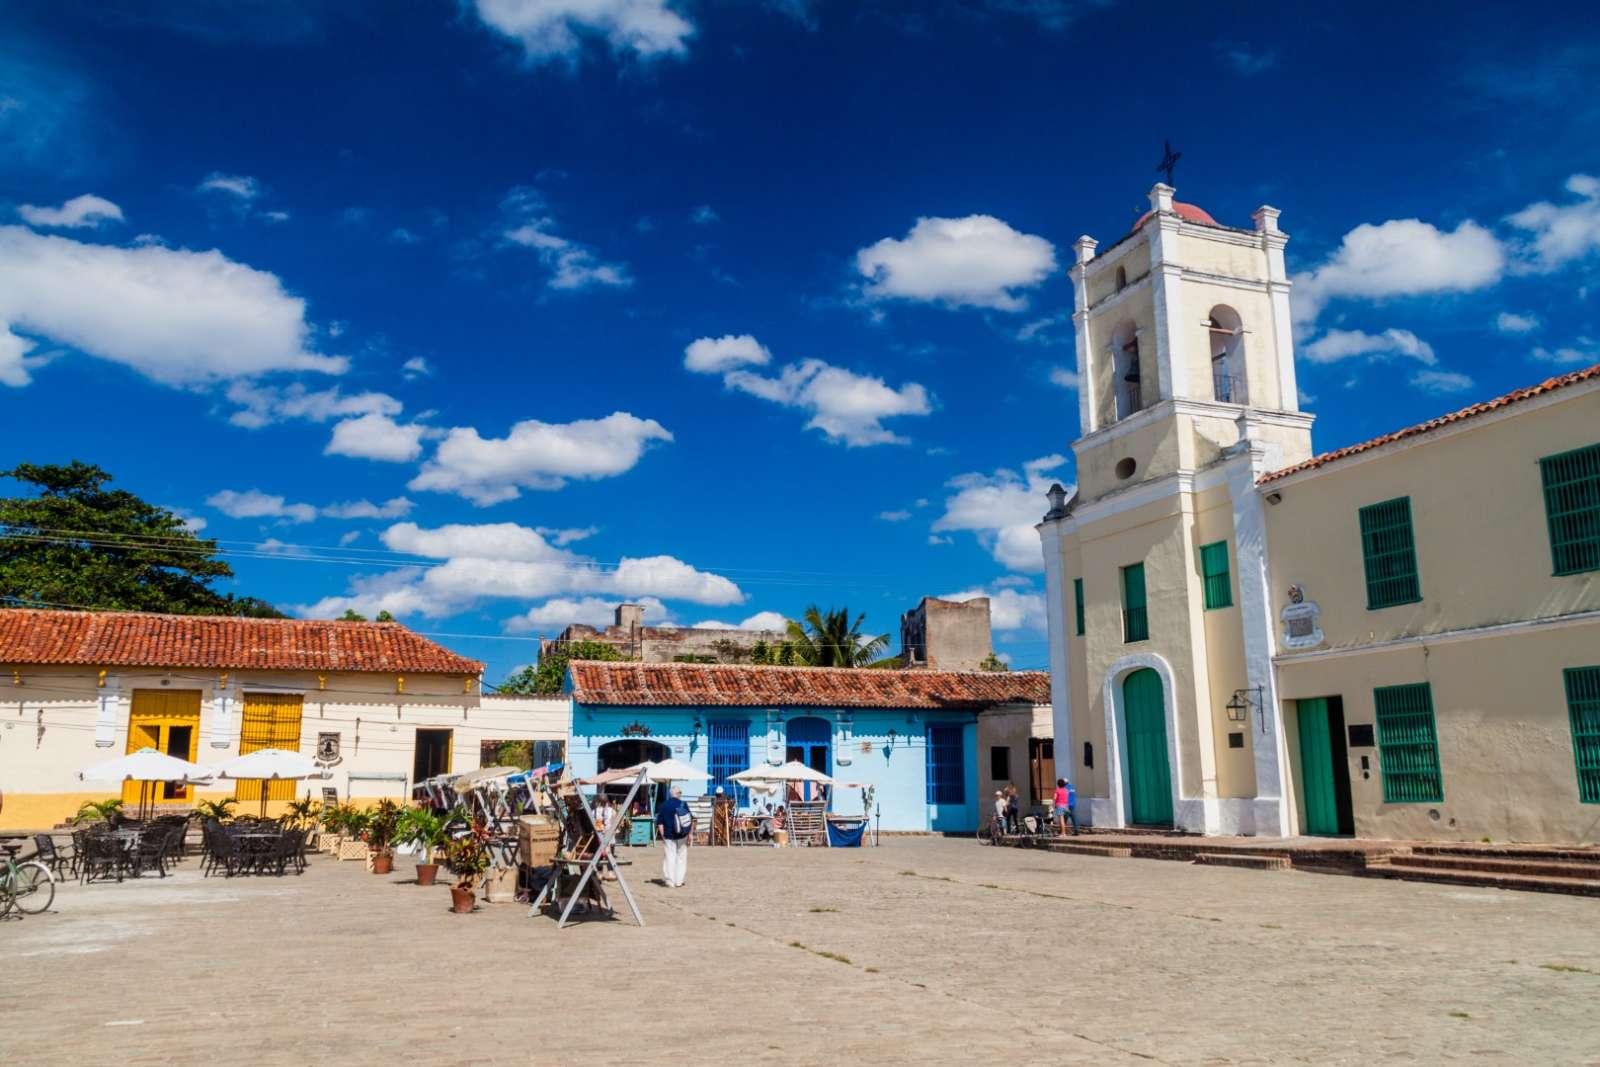 Plaza San Juan de Dios in Camaguey, Cuba